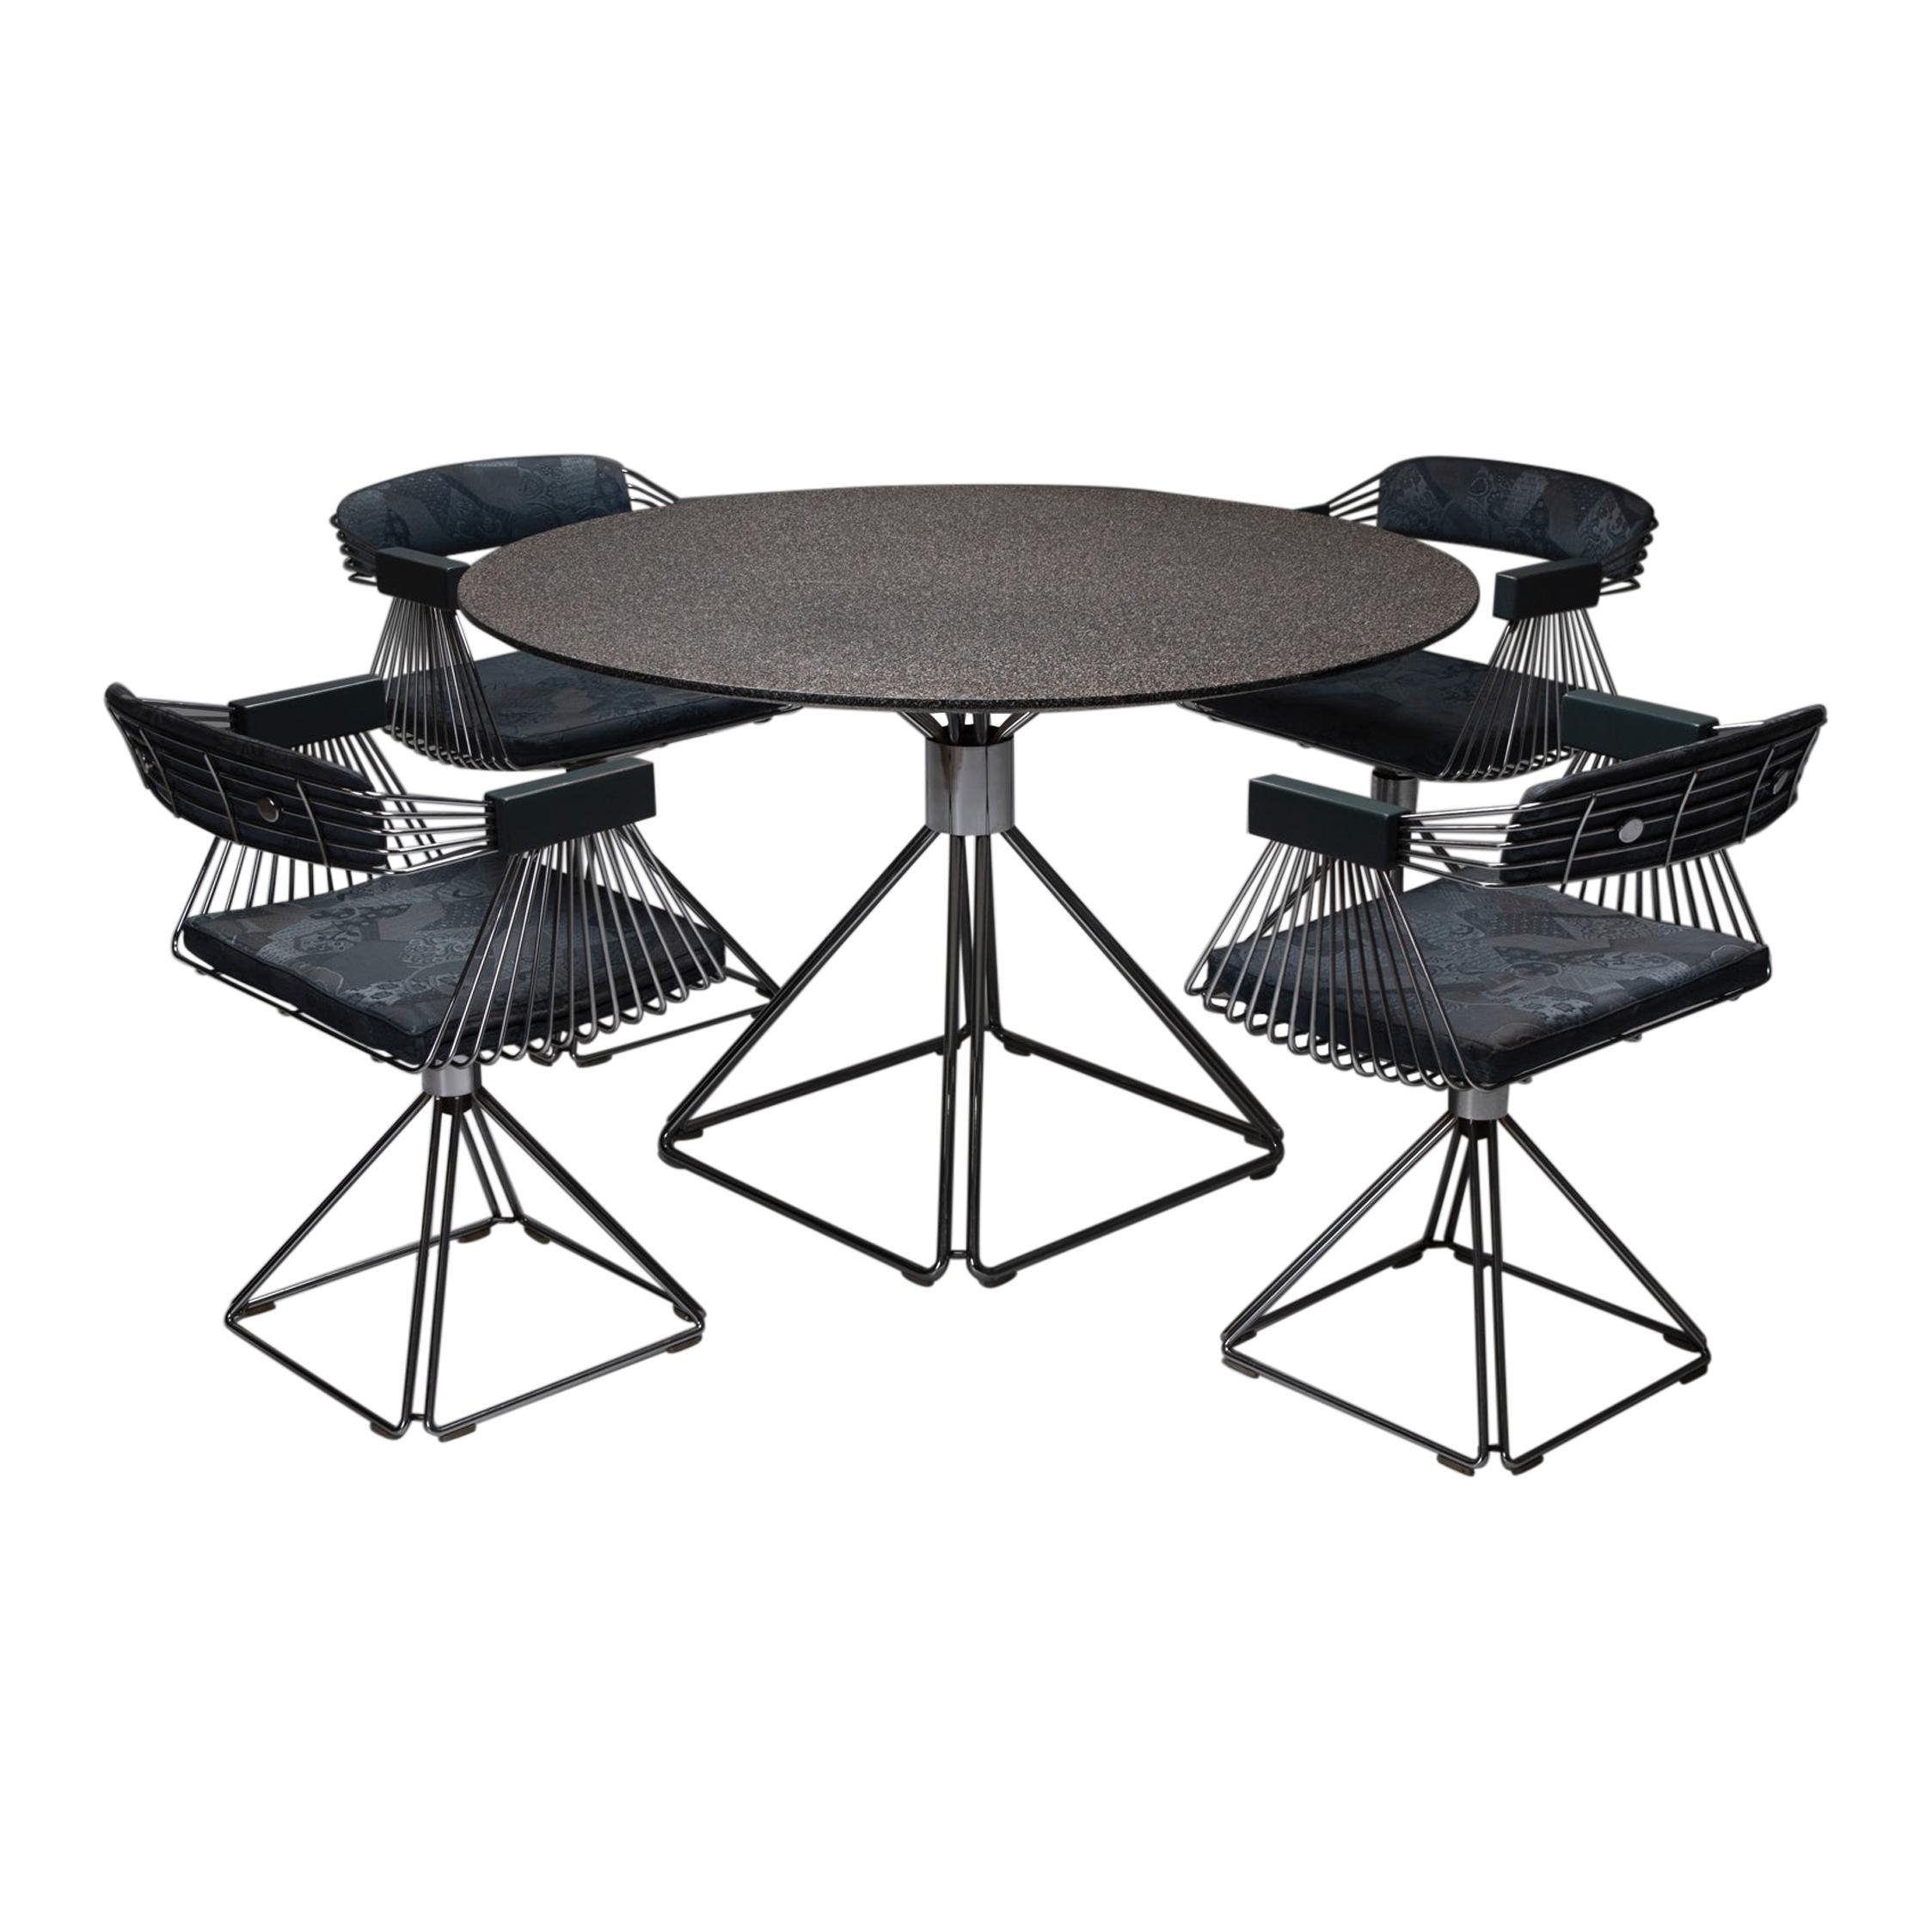 Mid-Century Modern Novalux Dining Set by Rudi Verelst